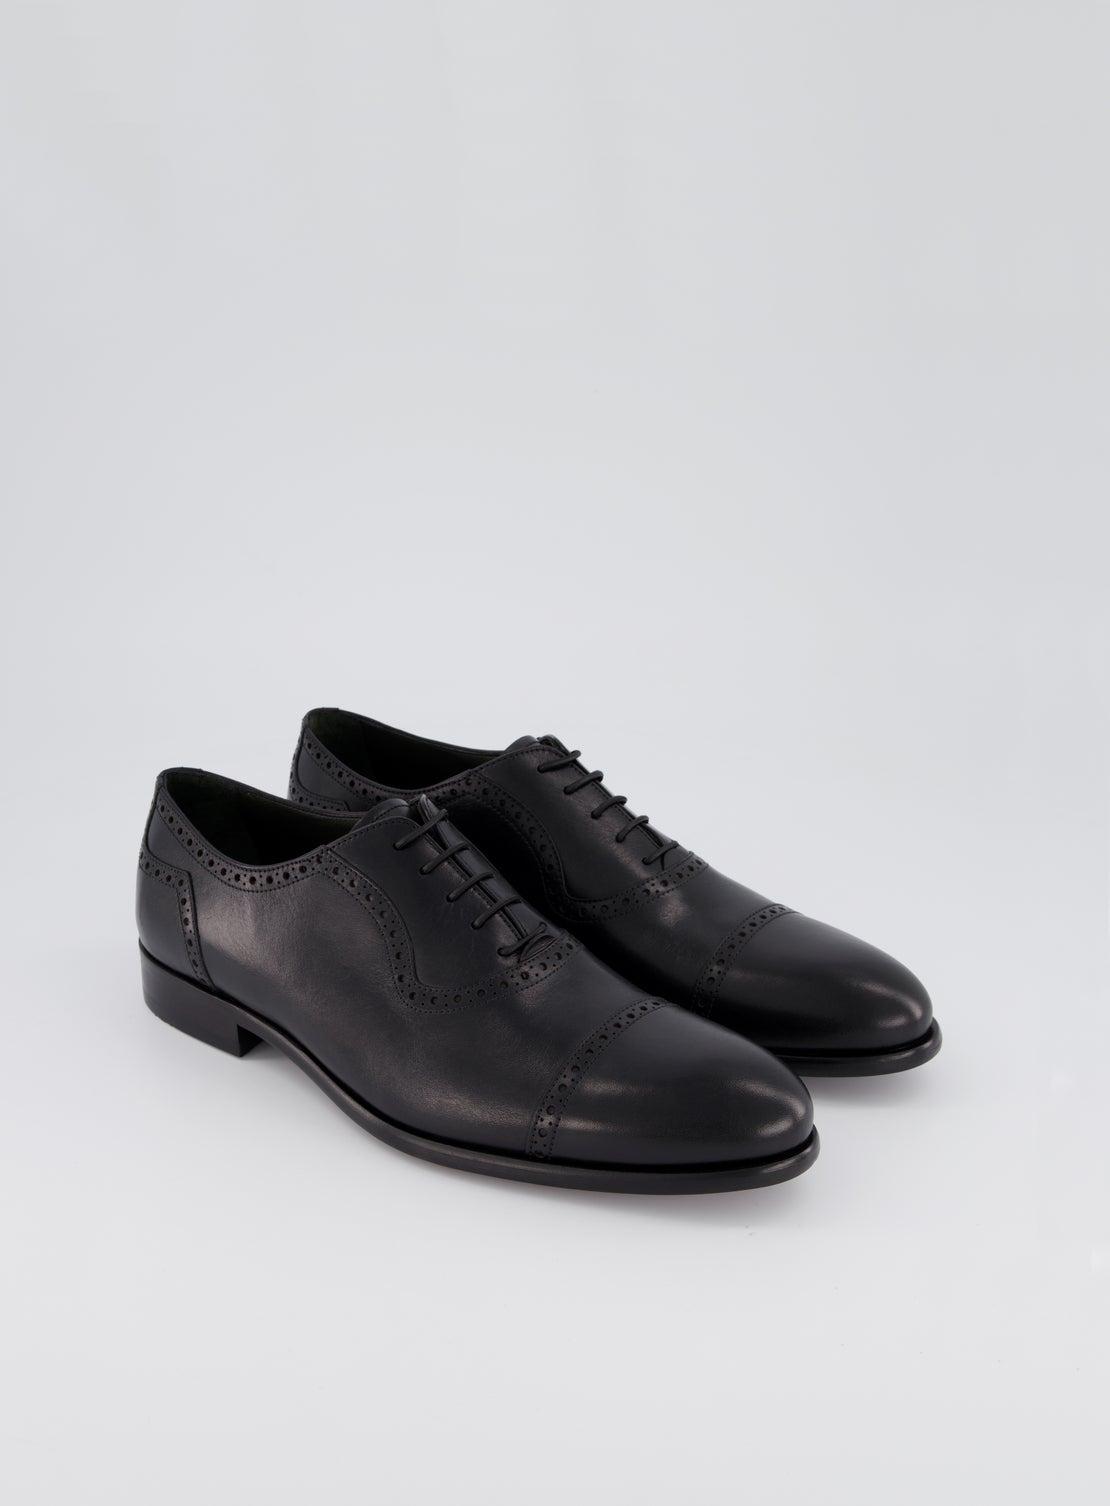 DM Black Brogue Shoe